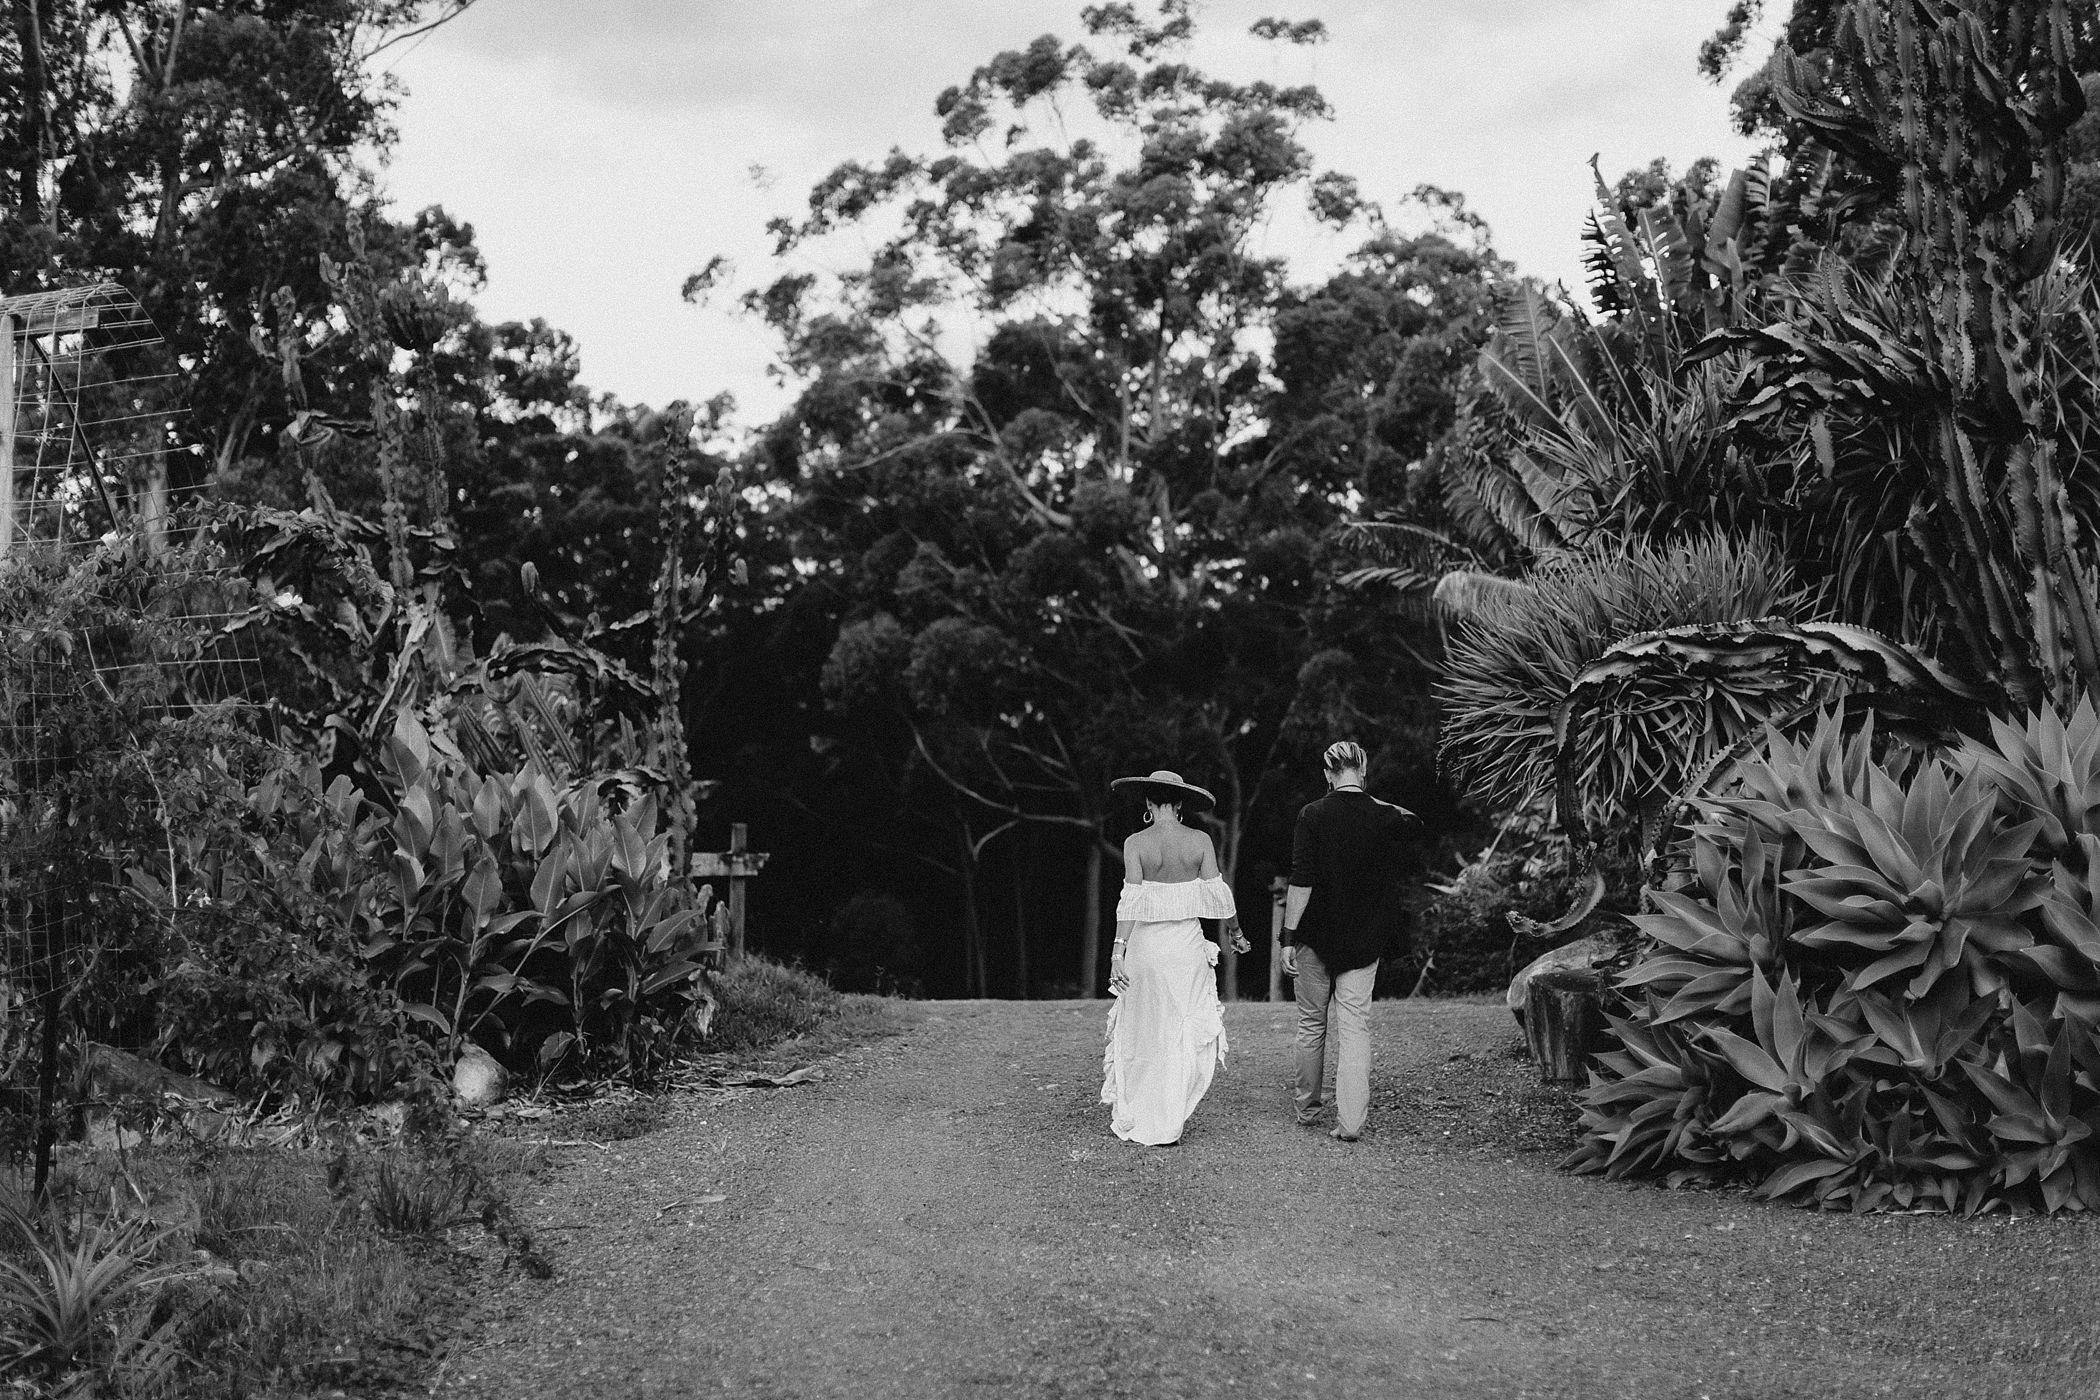 lauren-anne-photography-newcastle-hunter-valley-wedding-photographer_1049.jpg